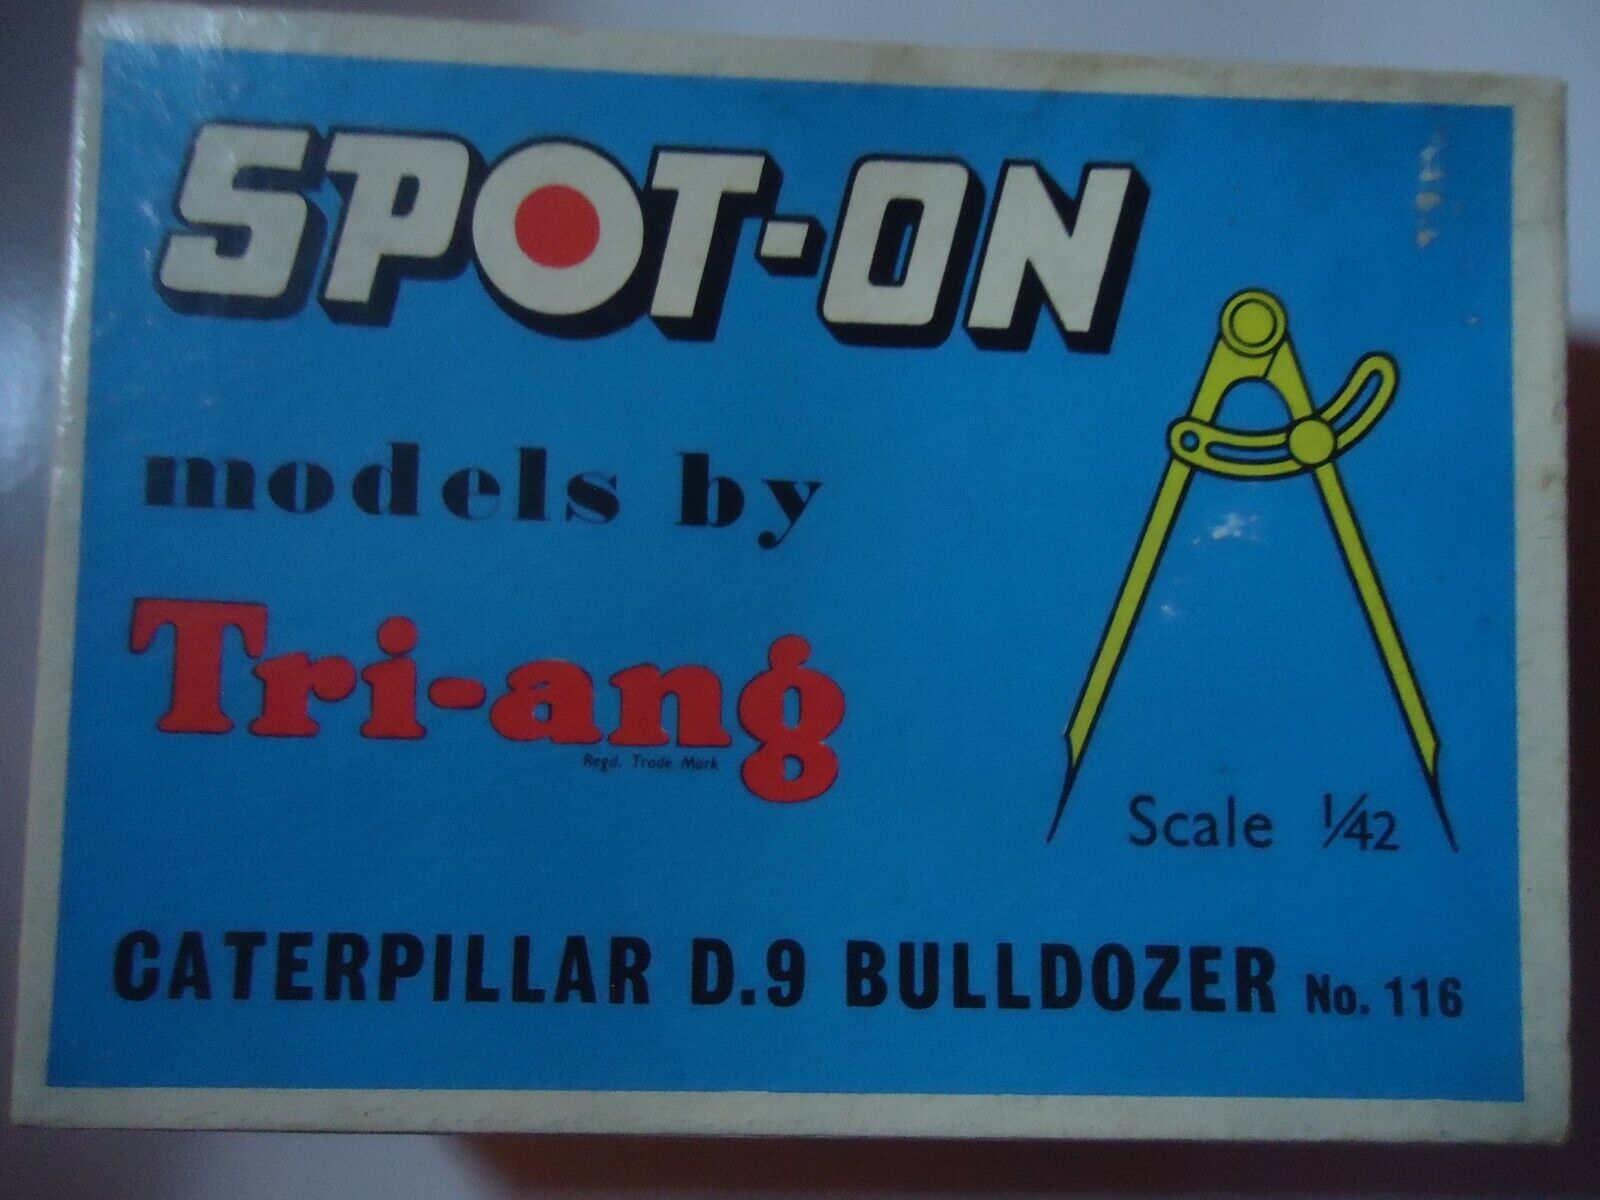 CATERPILLAR D-9 BULLDOZER BY SPOT ON(TRI-ANG)